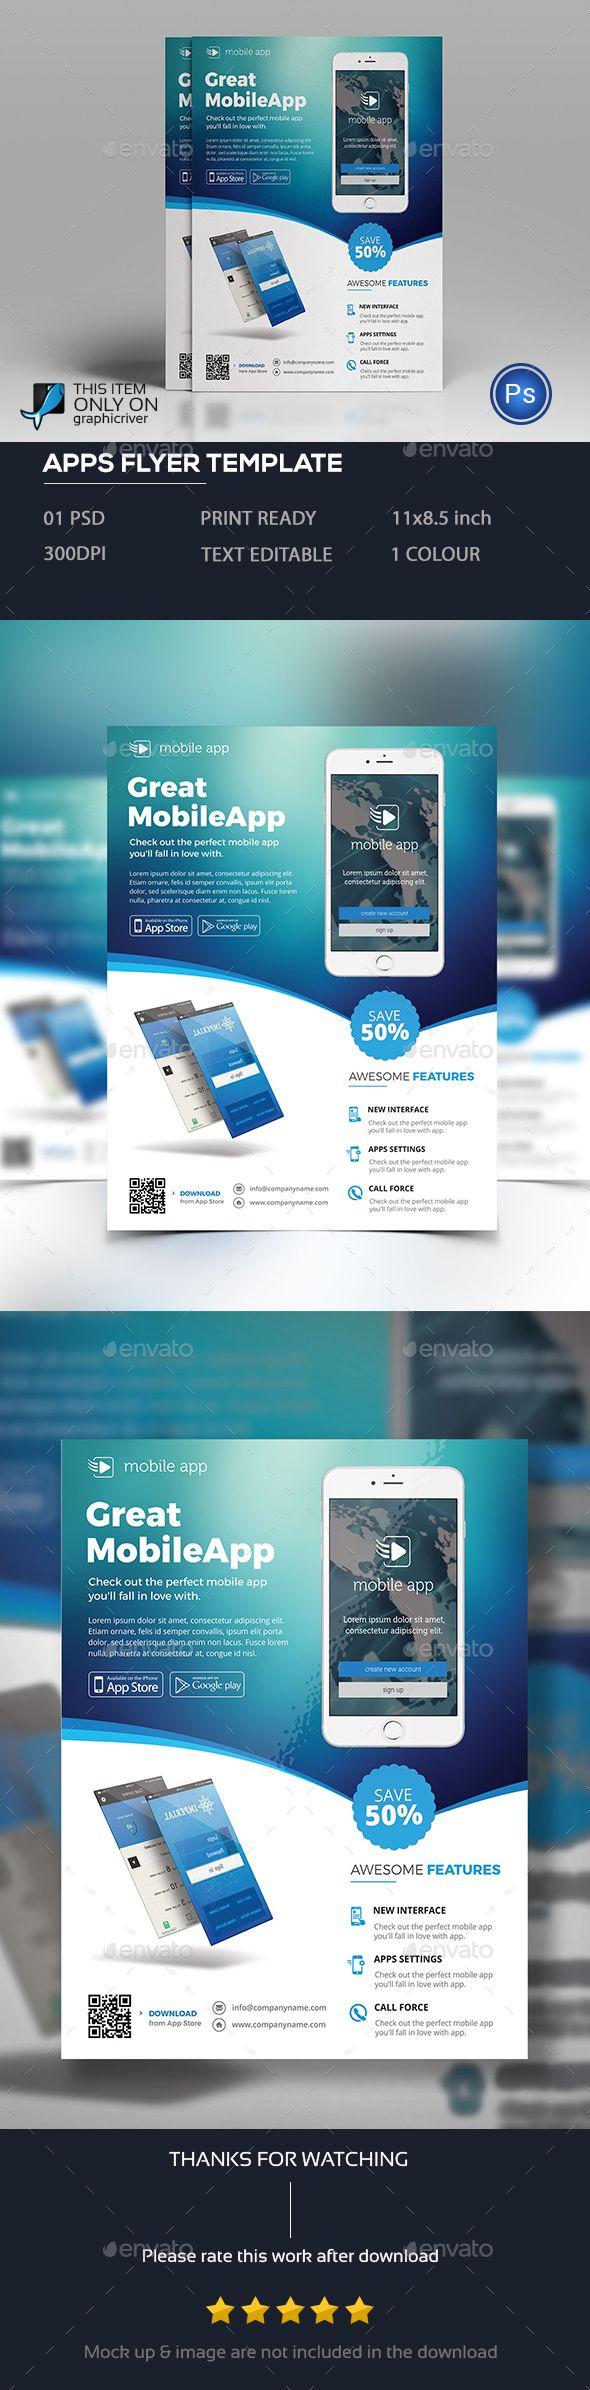 Apps Flyer Template PSD. Download here: http://graphicriver.net/item/apps-flyer/15930295?ref=ksioks